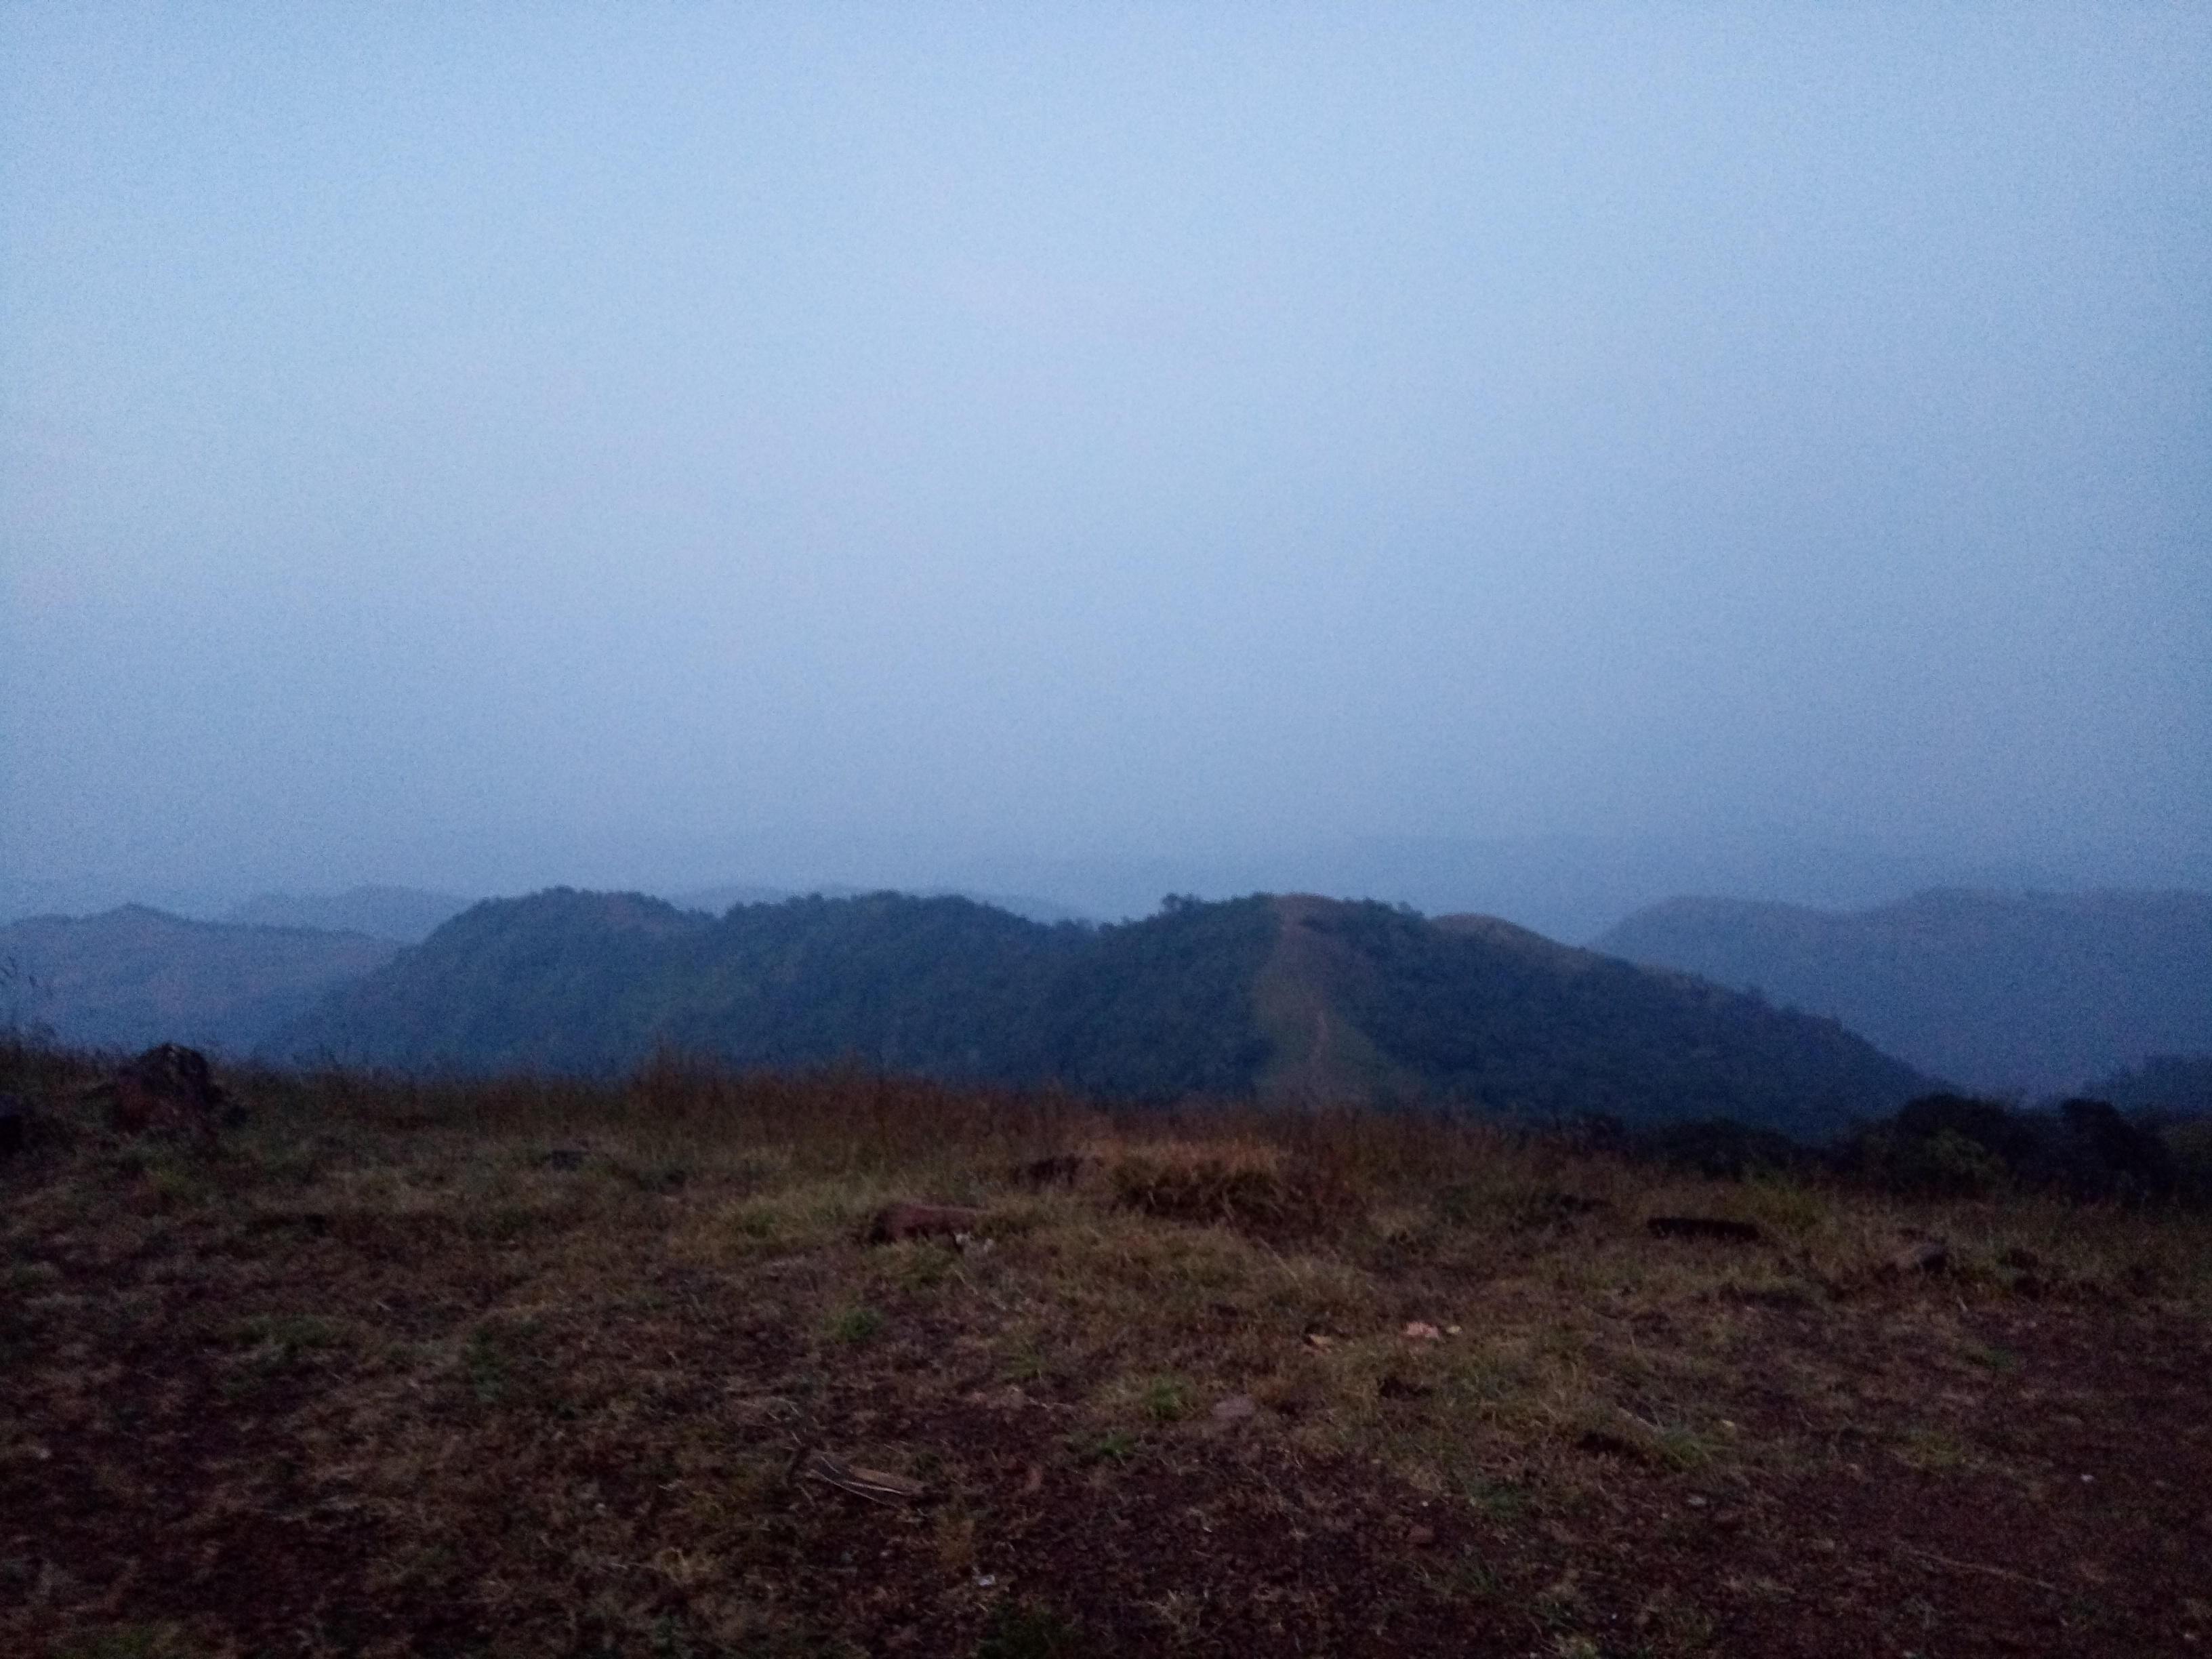 Monsoon Hikes South - Kodchadri in Karnataka